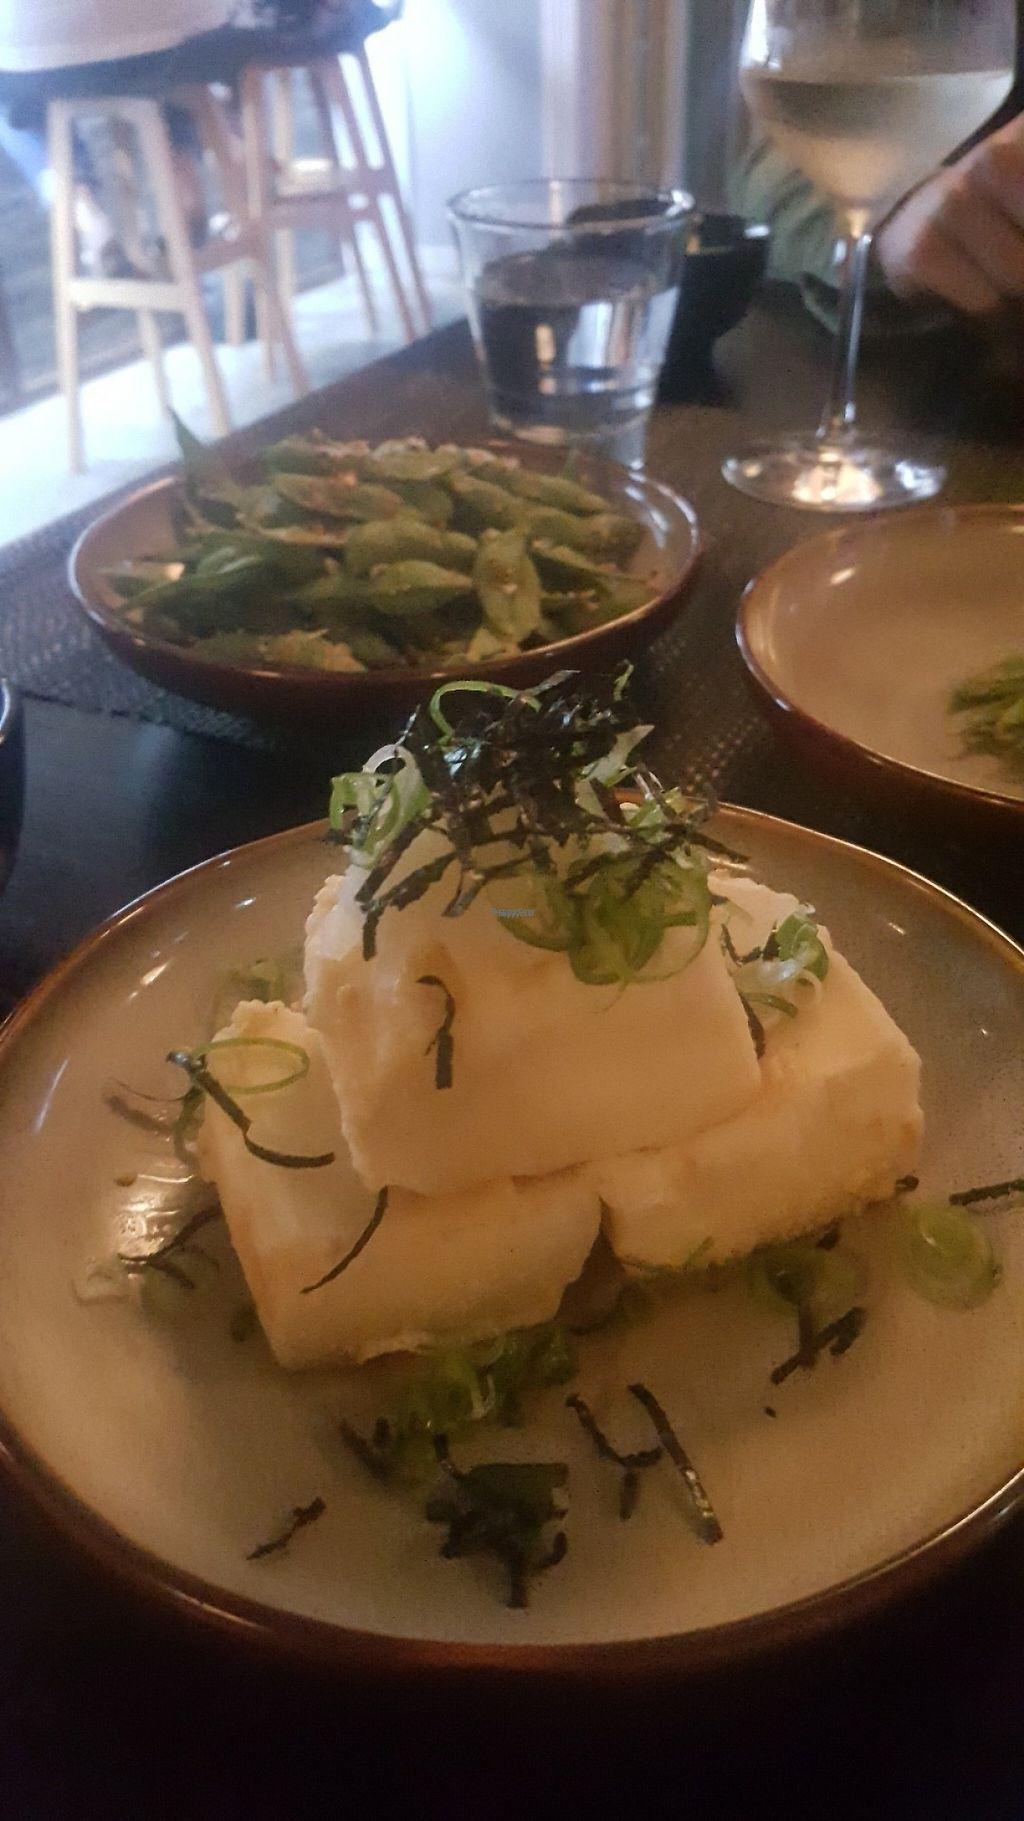 "Photo of Kanpai Japanese Restaurant  by <a href=""/members/profile/GenevieveMareeHartne"">GenevieveMareeHartne</a> <br/>Deep fried tofu, edamame <br/> January 25, 2017  - <a href='/contact/abuse/image/86020/216646'>Report</a>"